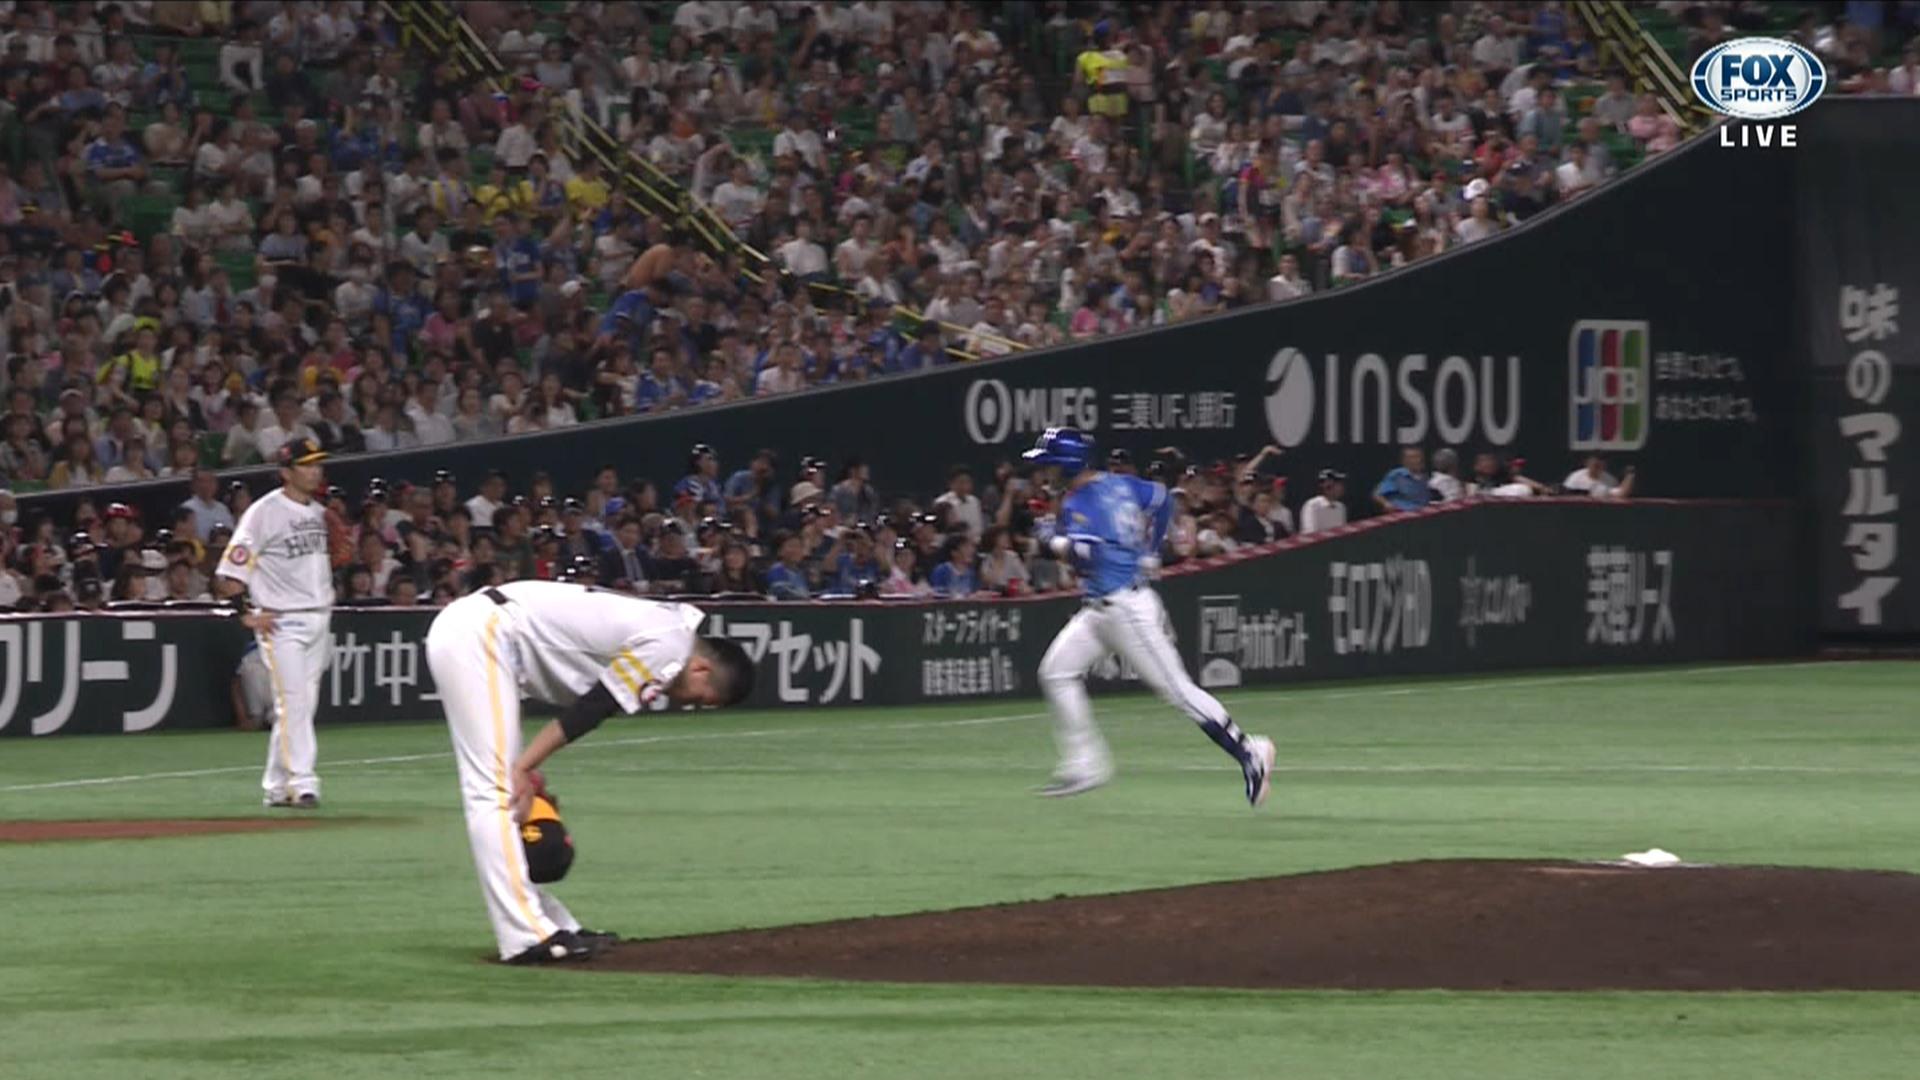 DeNA・ソト、千賀から満塁ホームランwwww